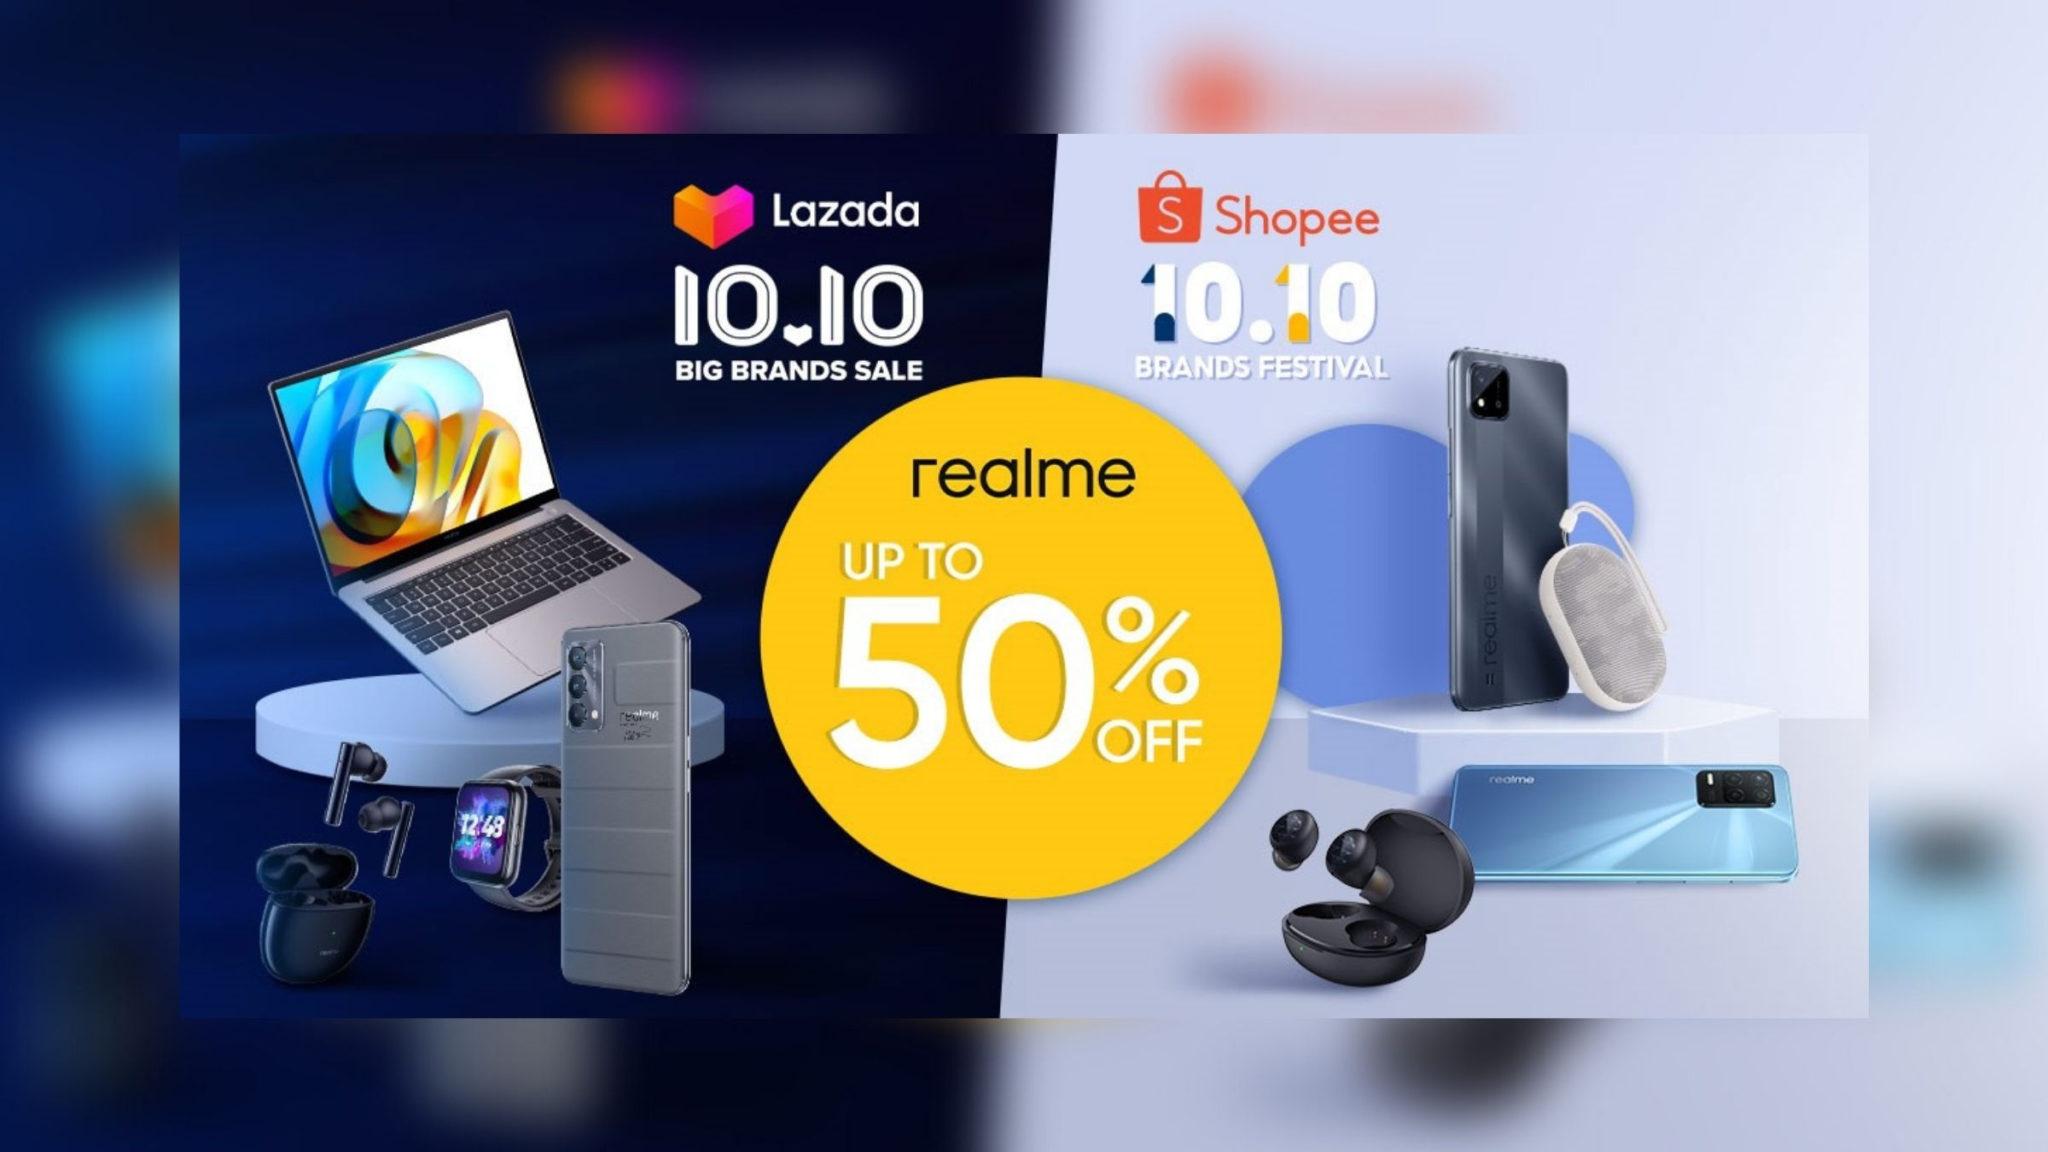 realme Devices 10.10 Sale Header